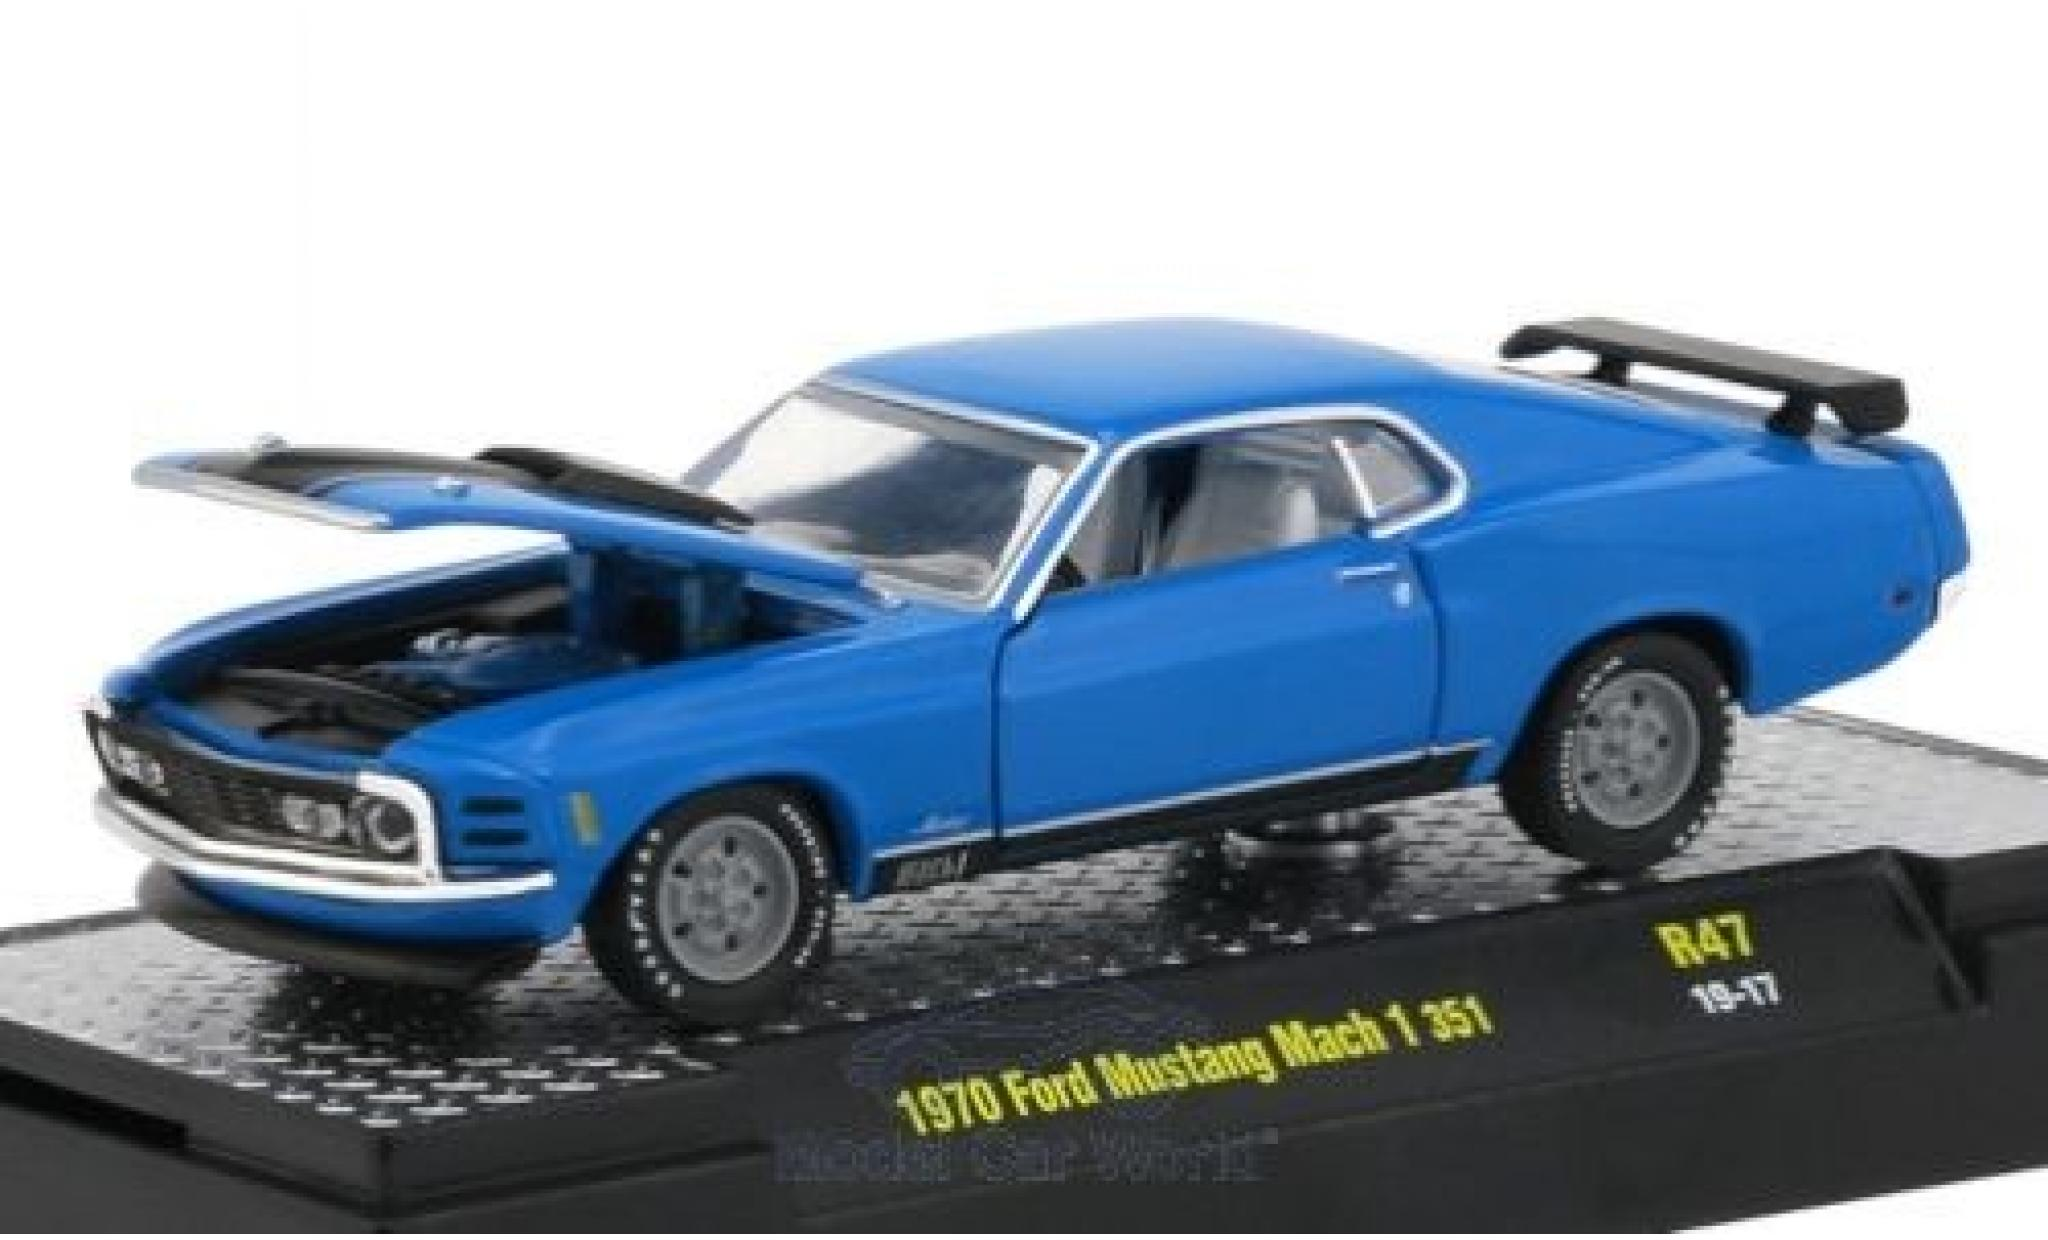 Ford Mustang 1/64 M2 Machines Mach 1 351 blue/matt-black 1970